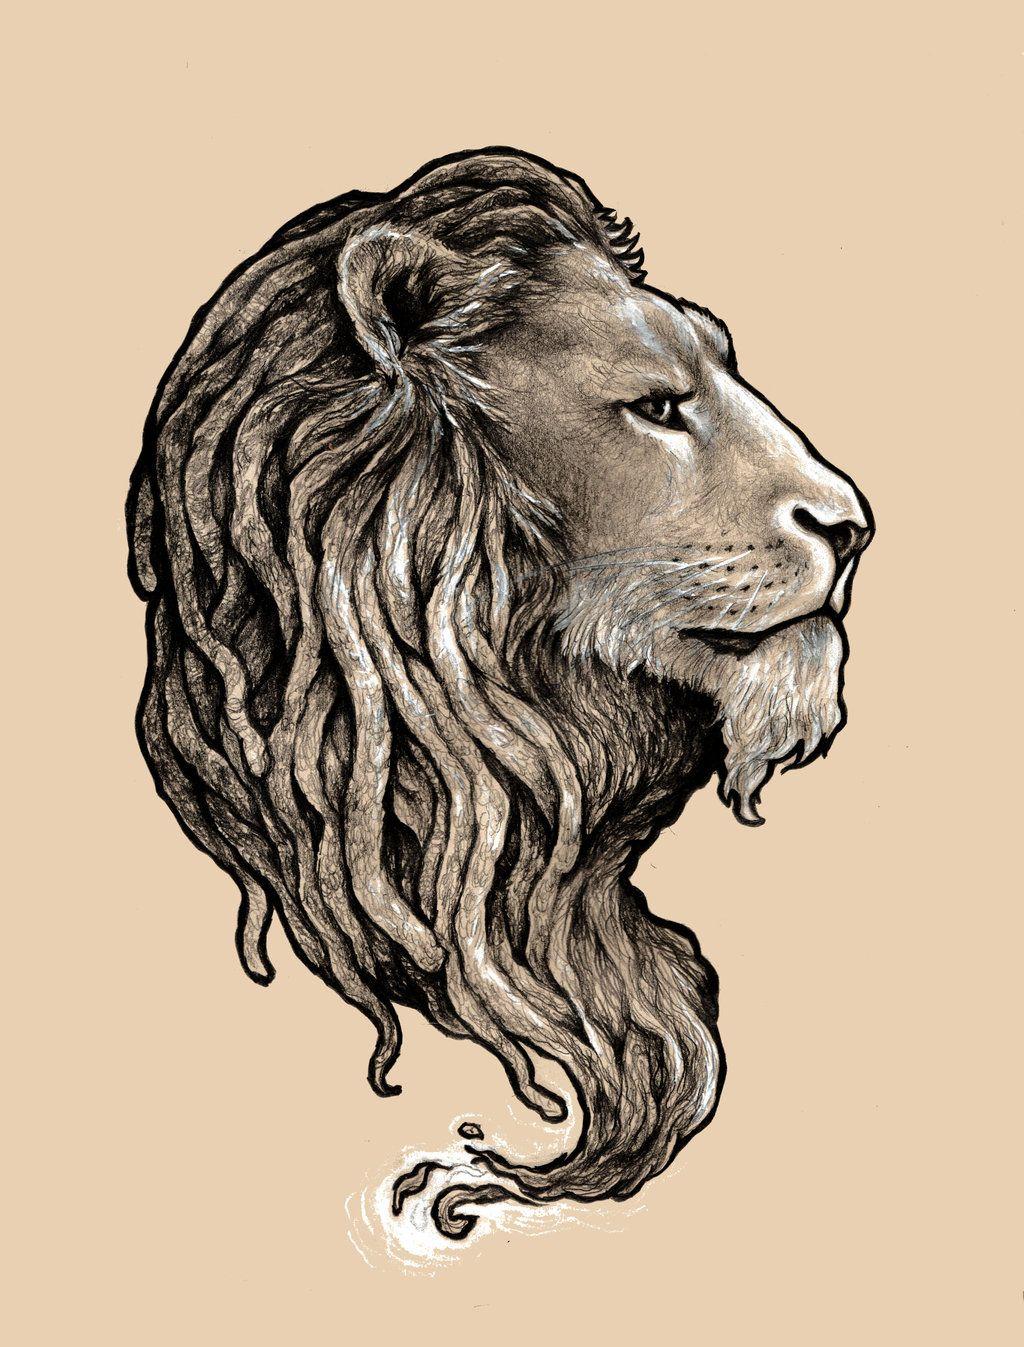 rasta lion tattoo rasta lion tattoo designs rasta tiger tattoos pinterest ilustraciones. Black Bedroom Furniture Sets. Home Design Ideas